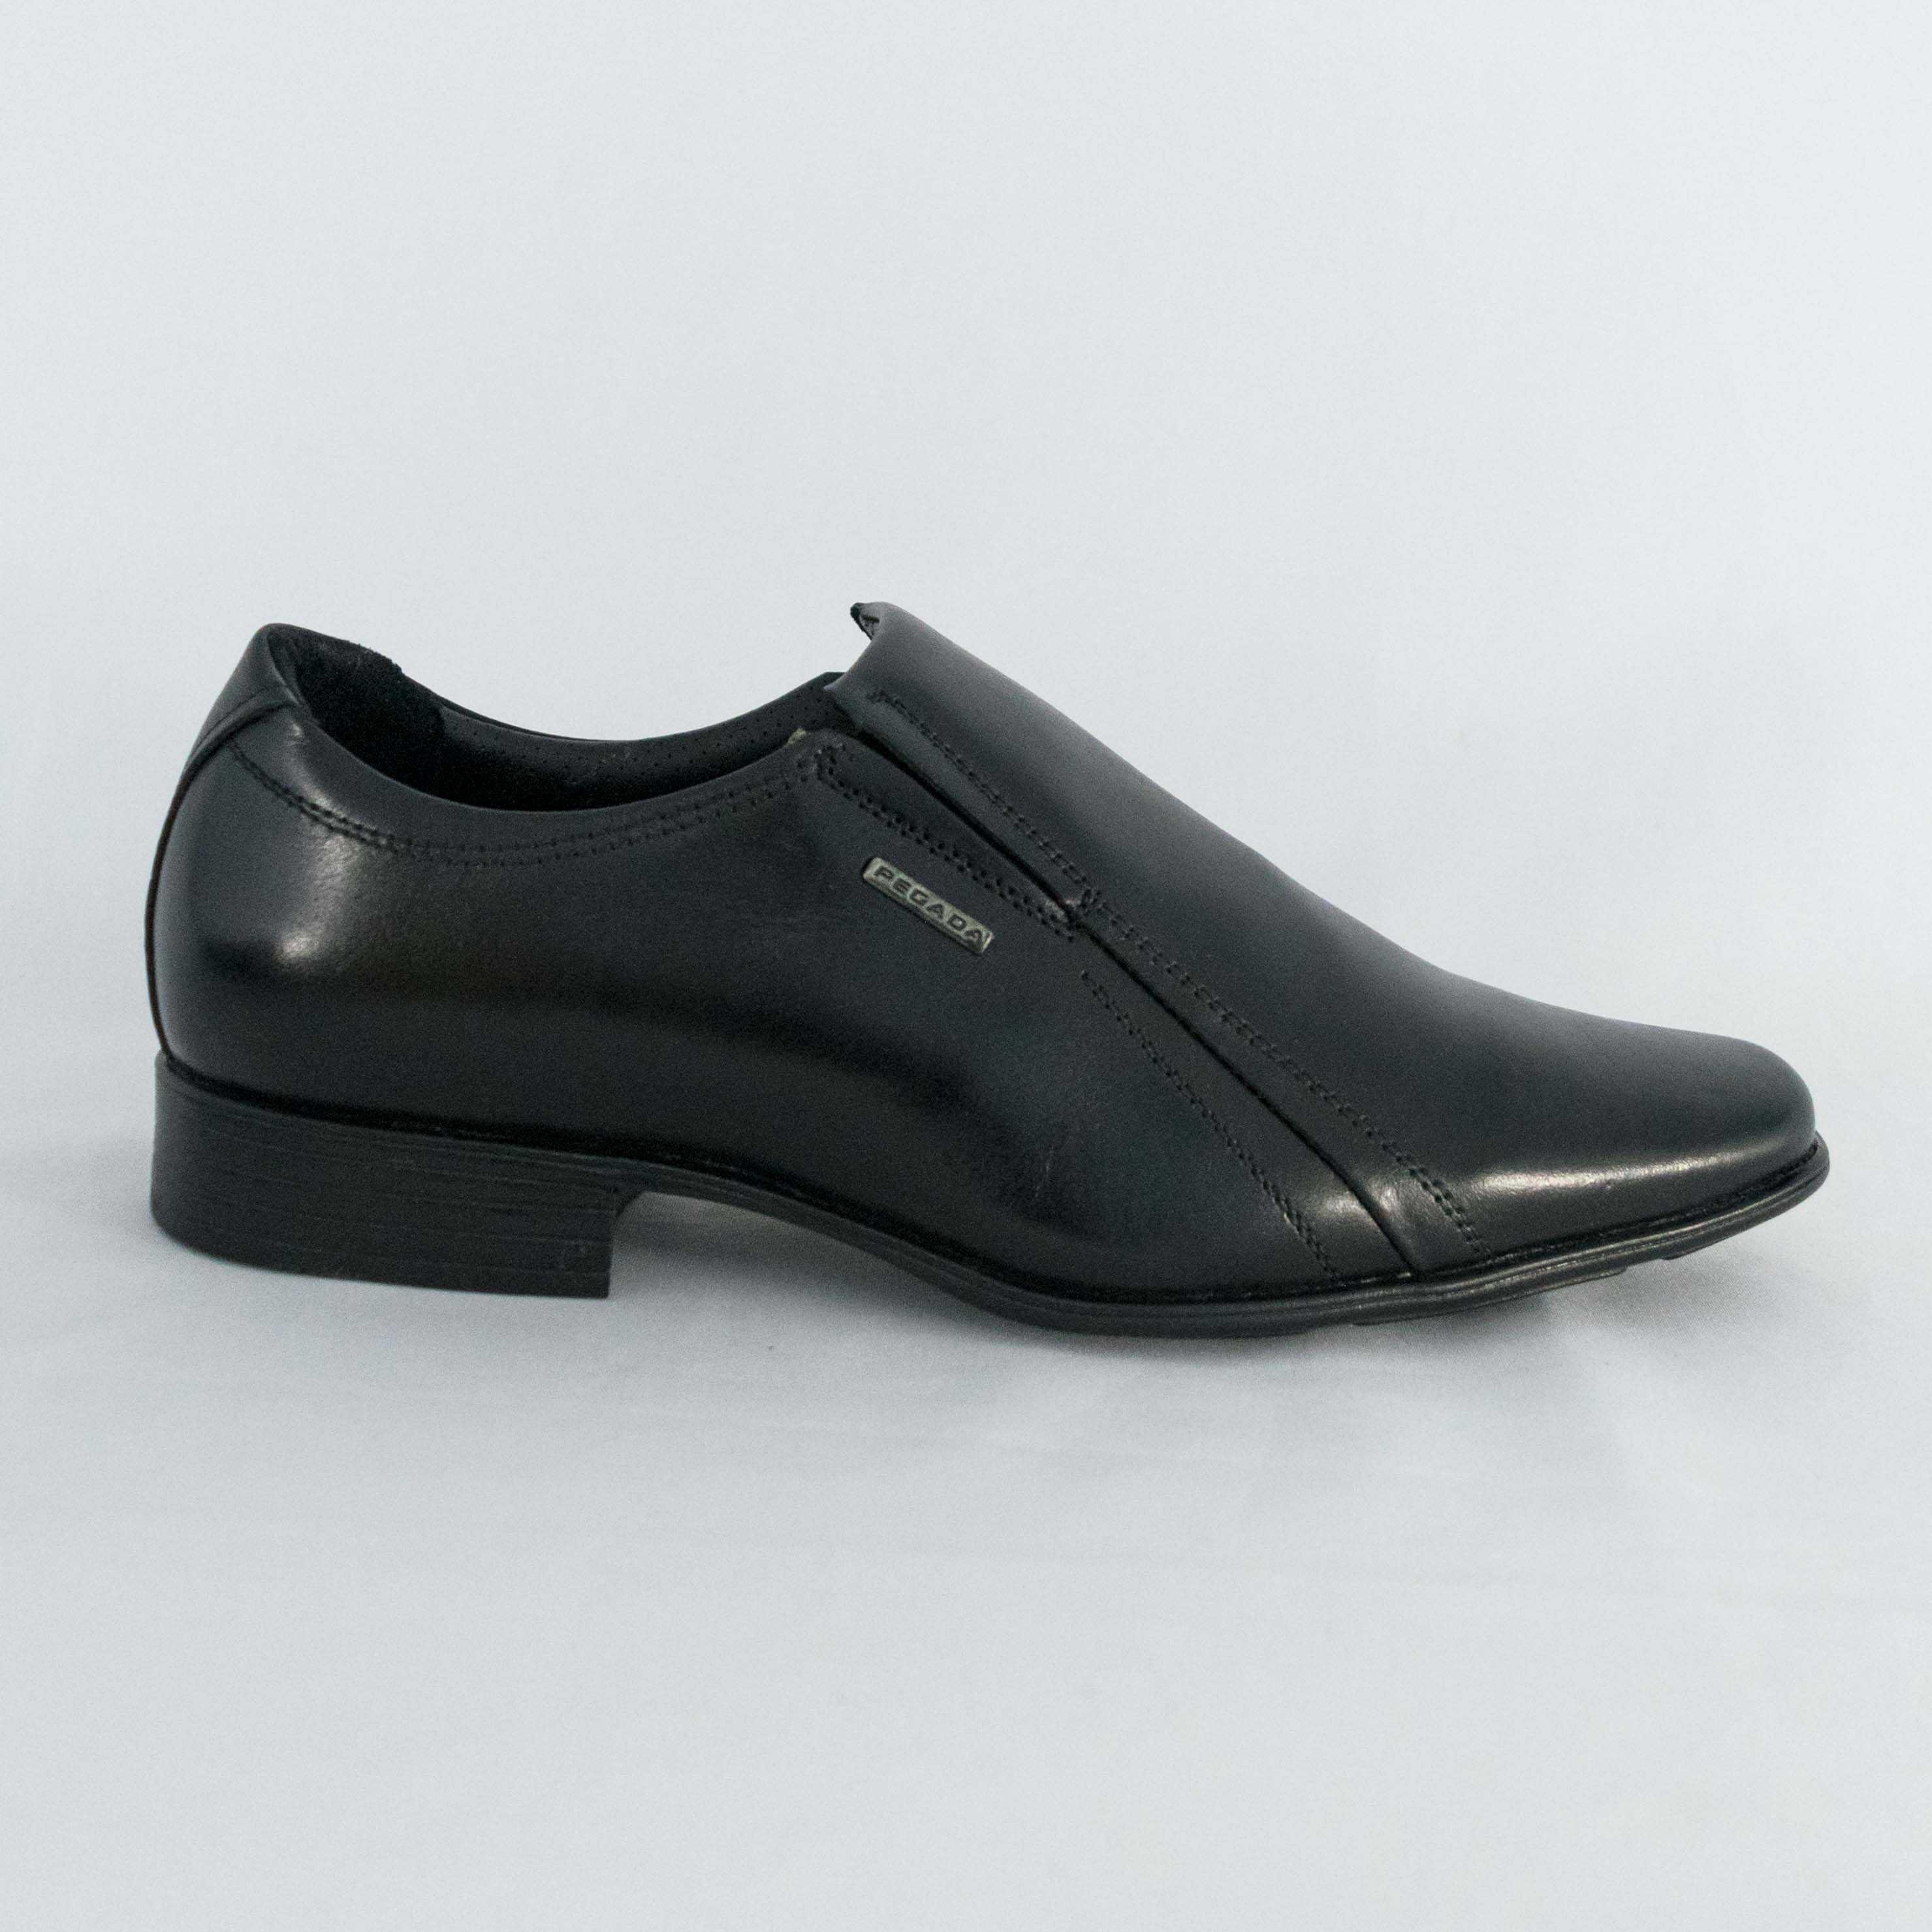 Sapato Pegada 124653 Anilina Preto liso